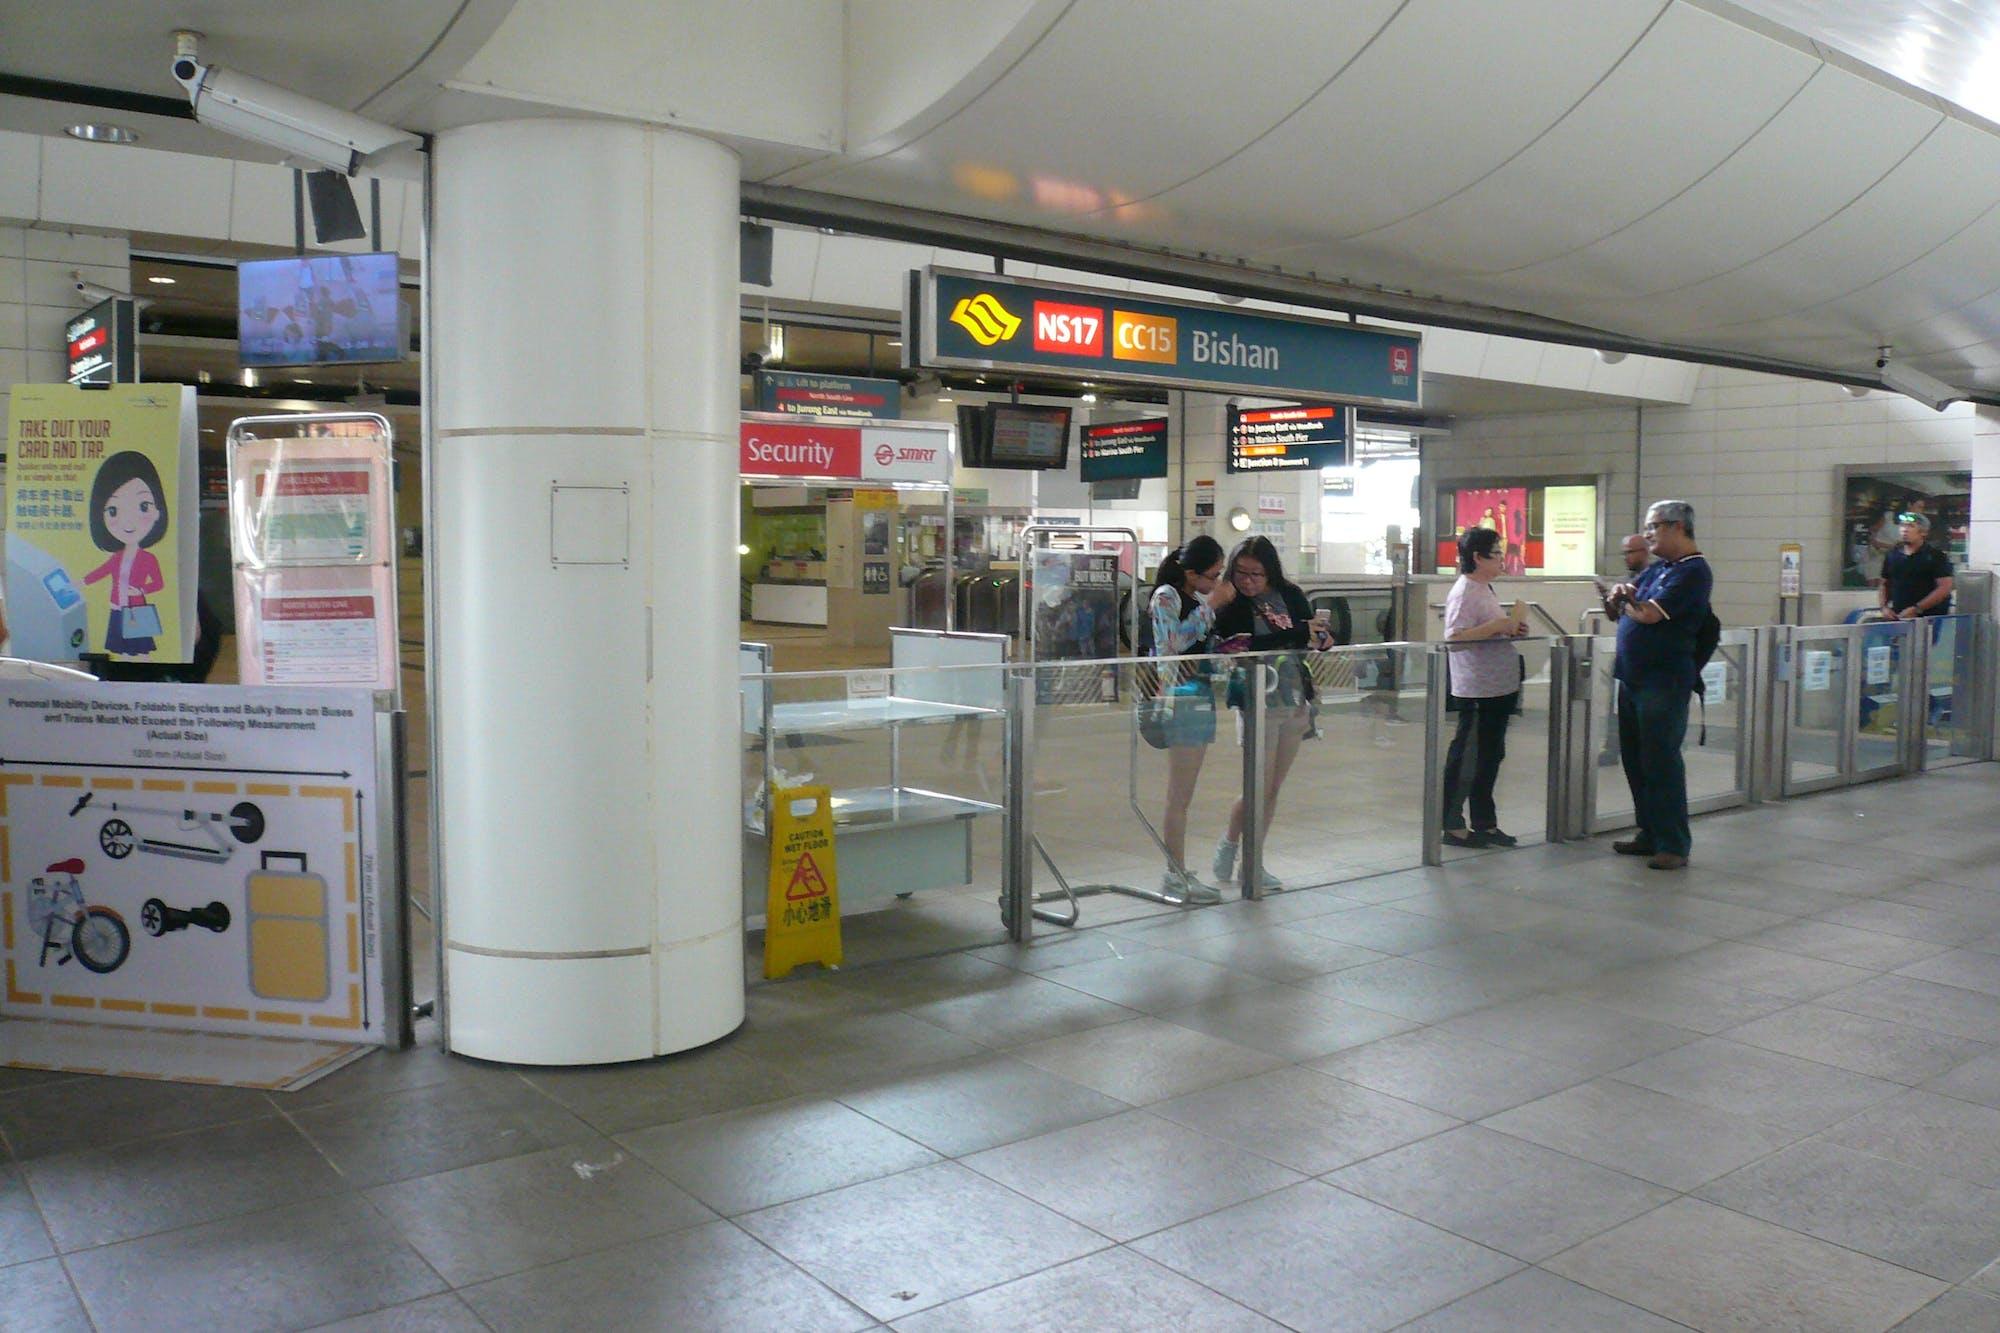 Bishan MRT Station